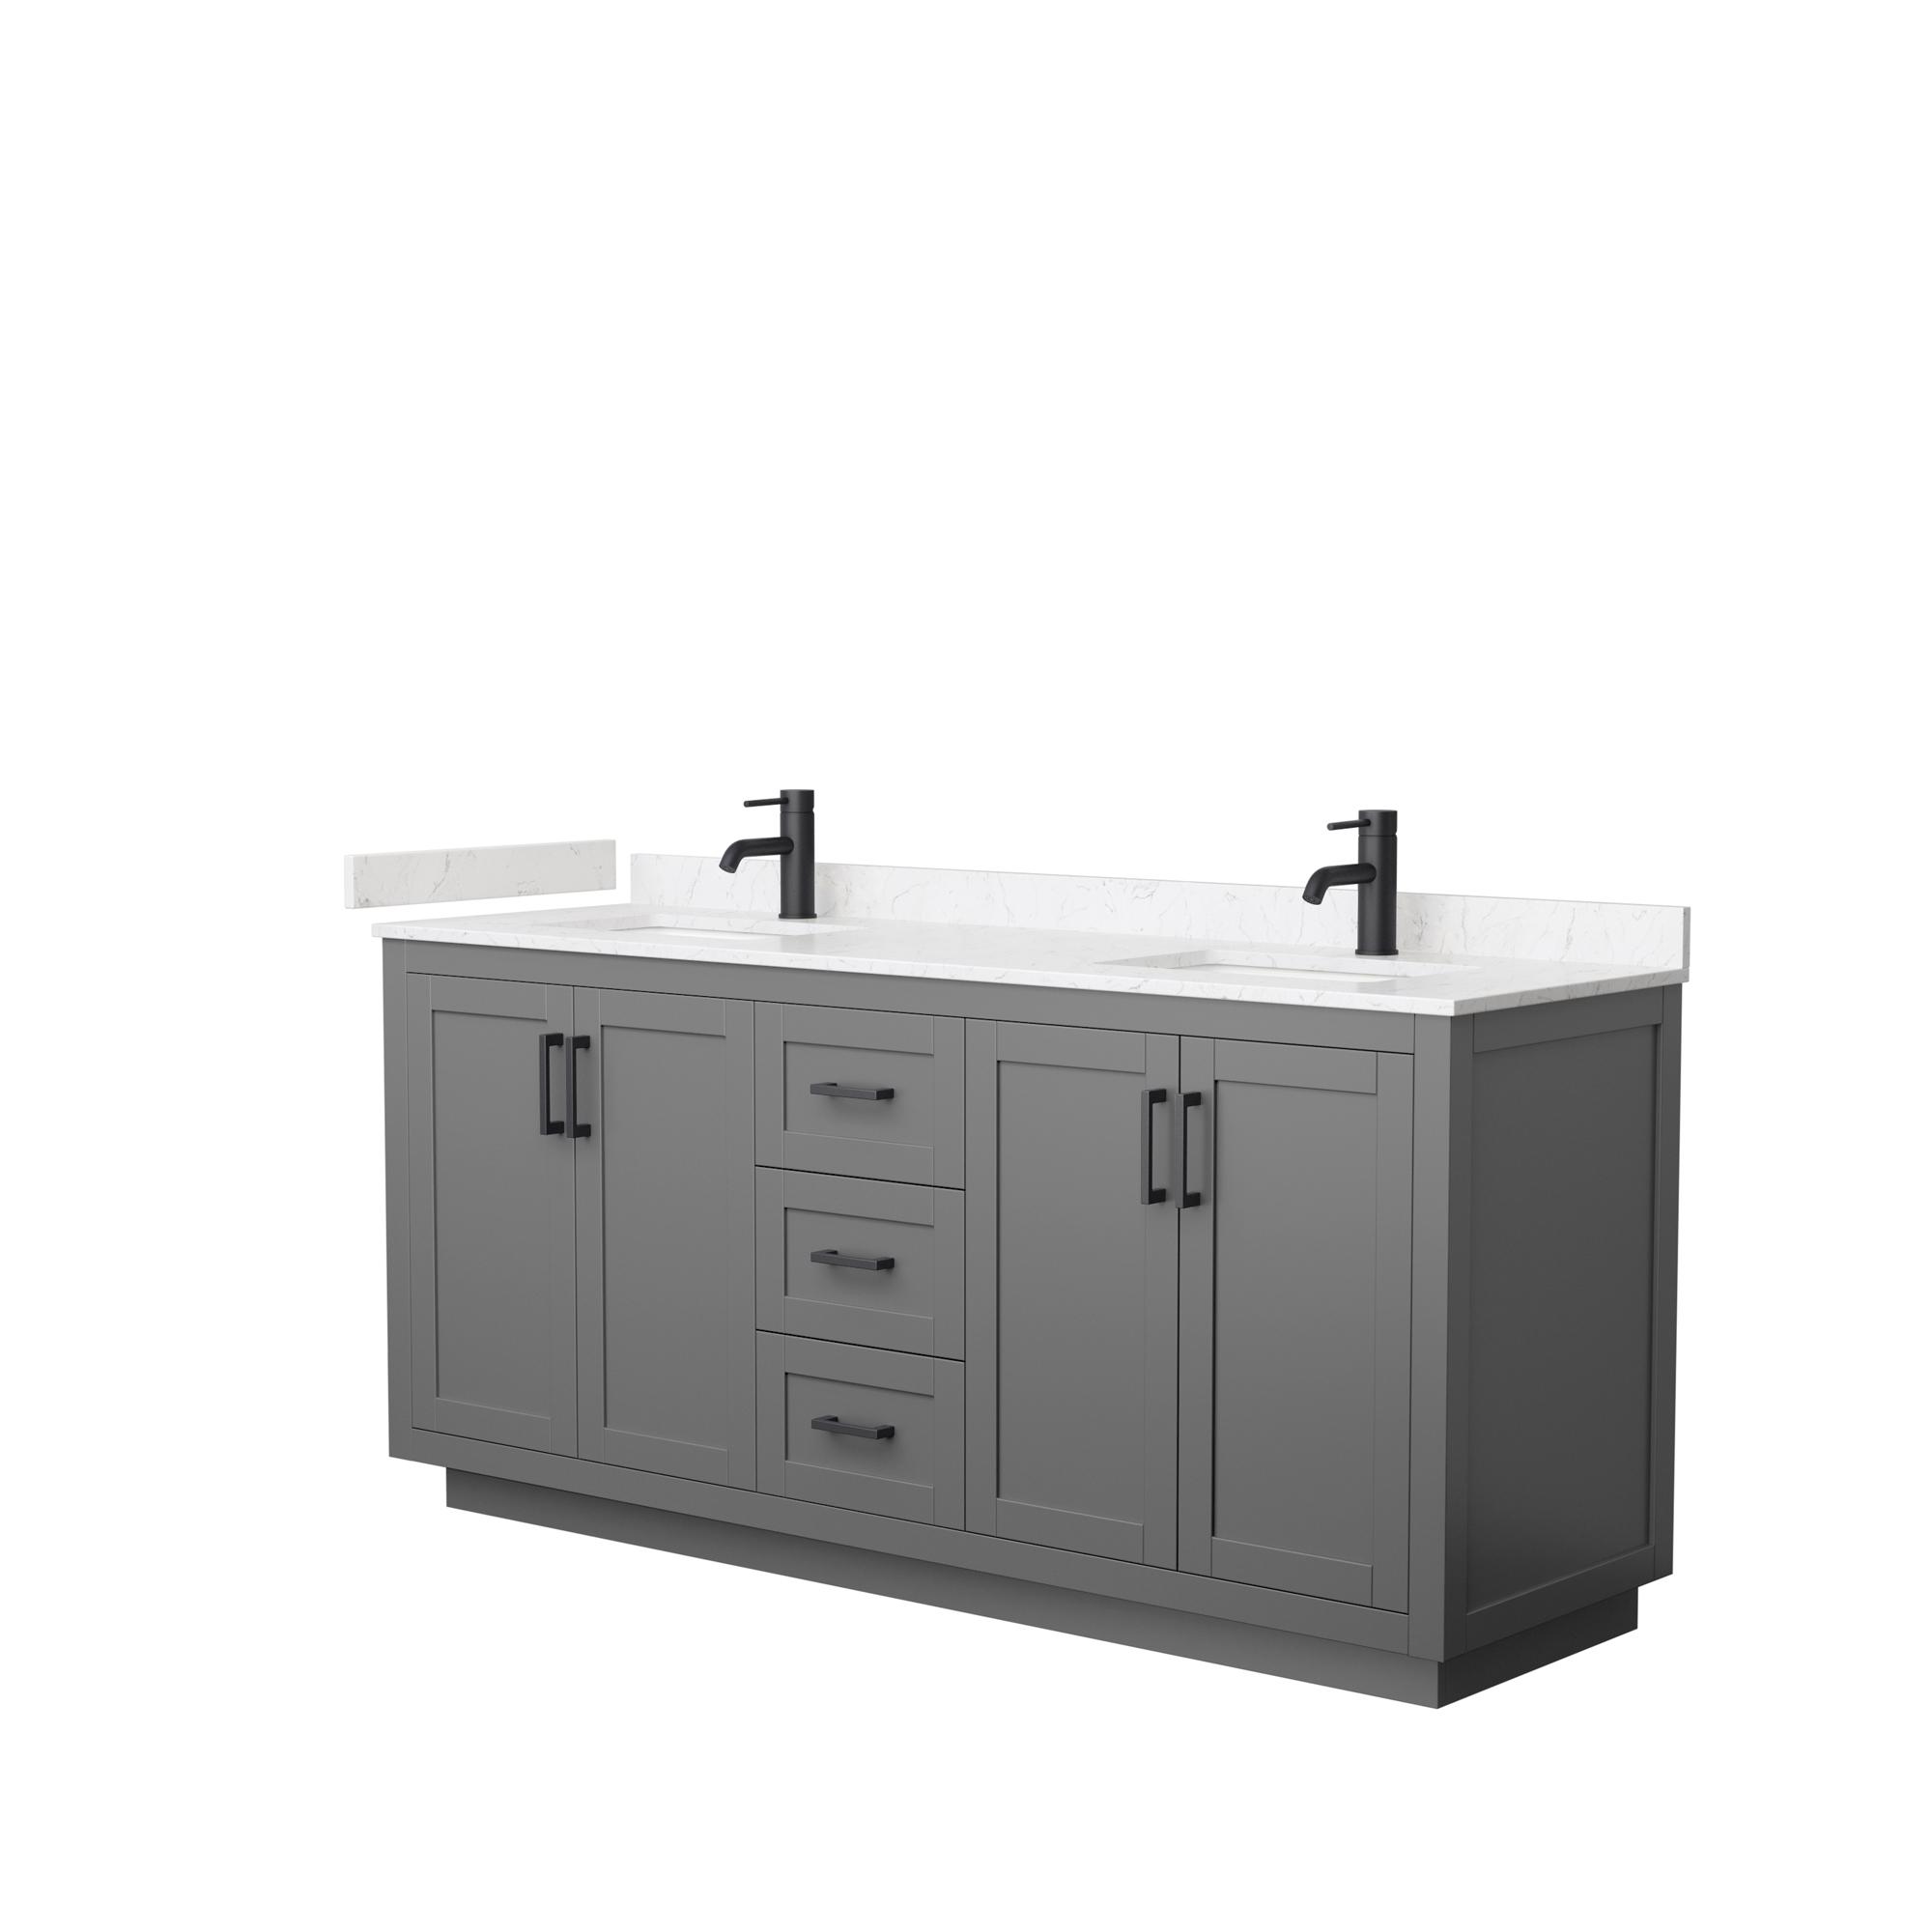 "72"" Double Bathroom Vanity in Dark Gray, Light-Vein Carrara Cultured Marble Countertop, Undermount Square Sinks, Matte Black Trim"